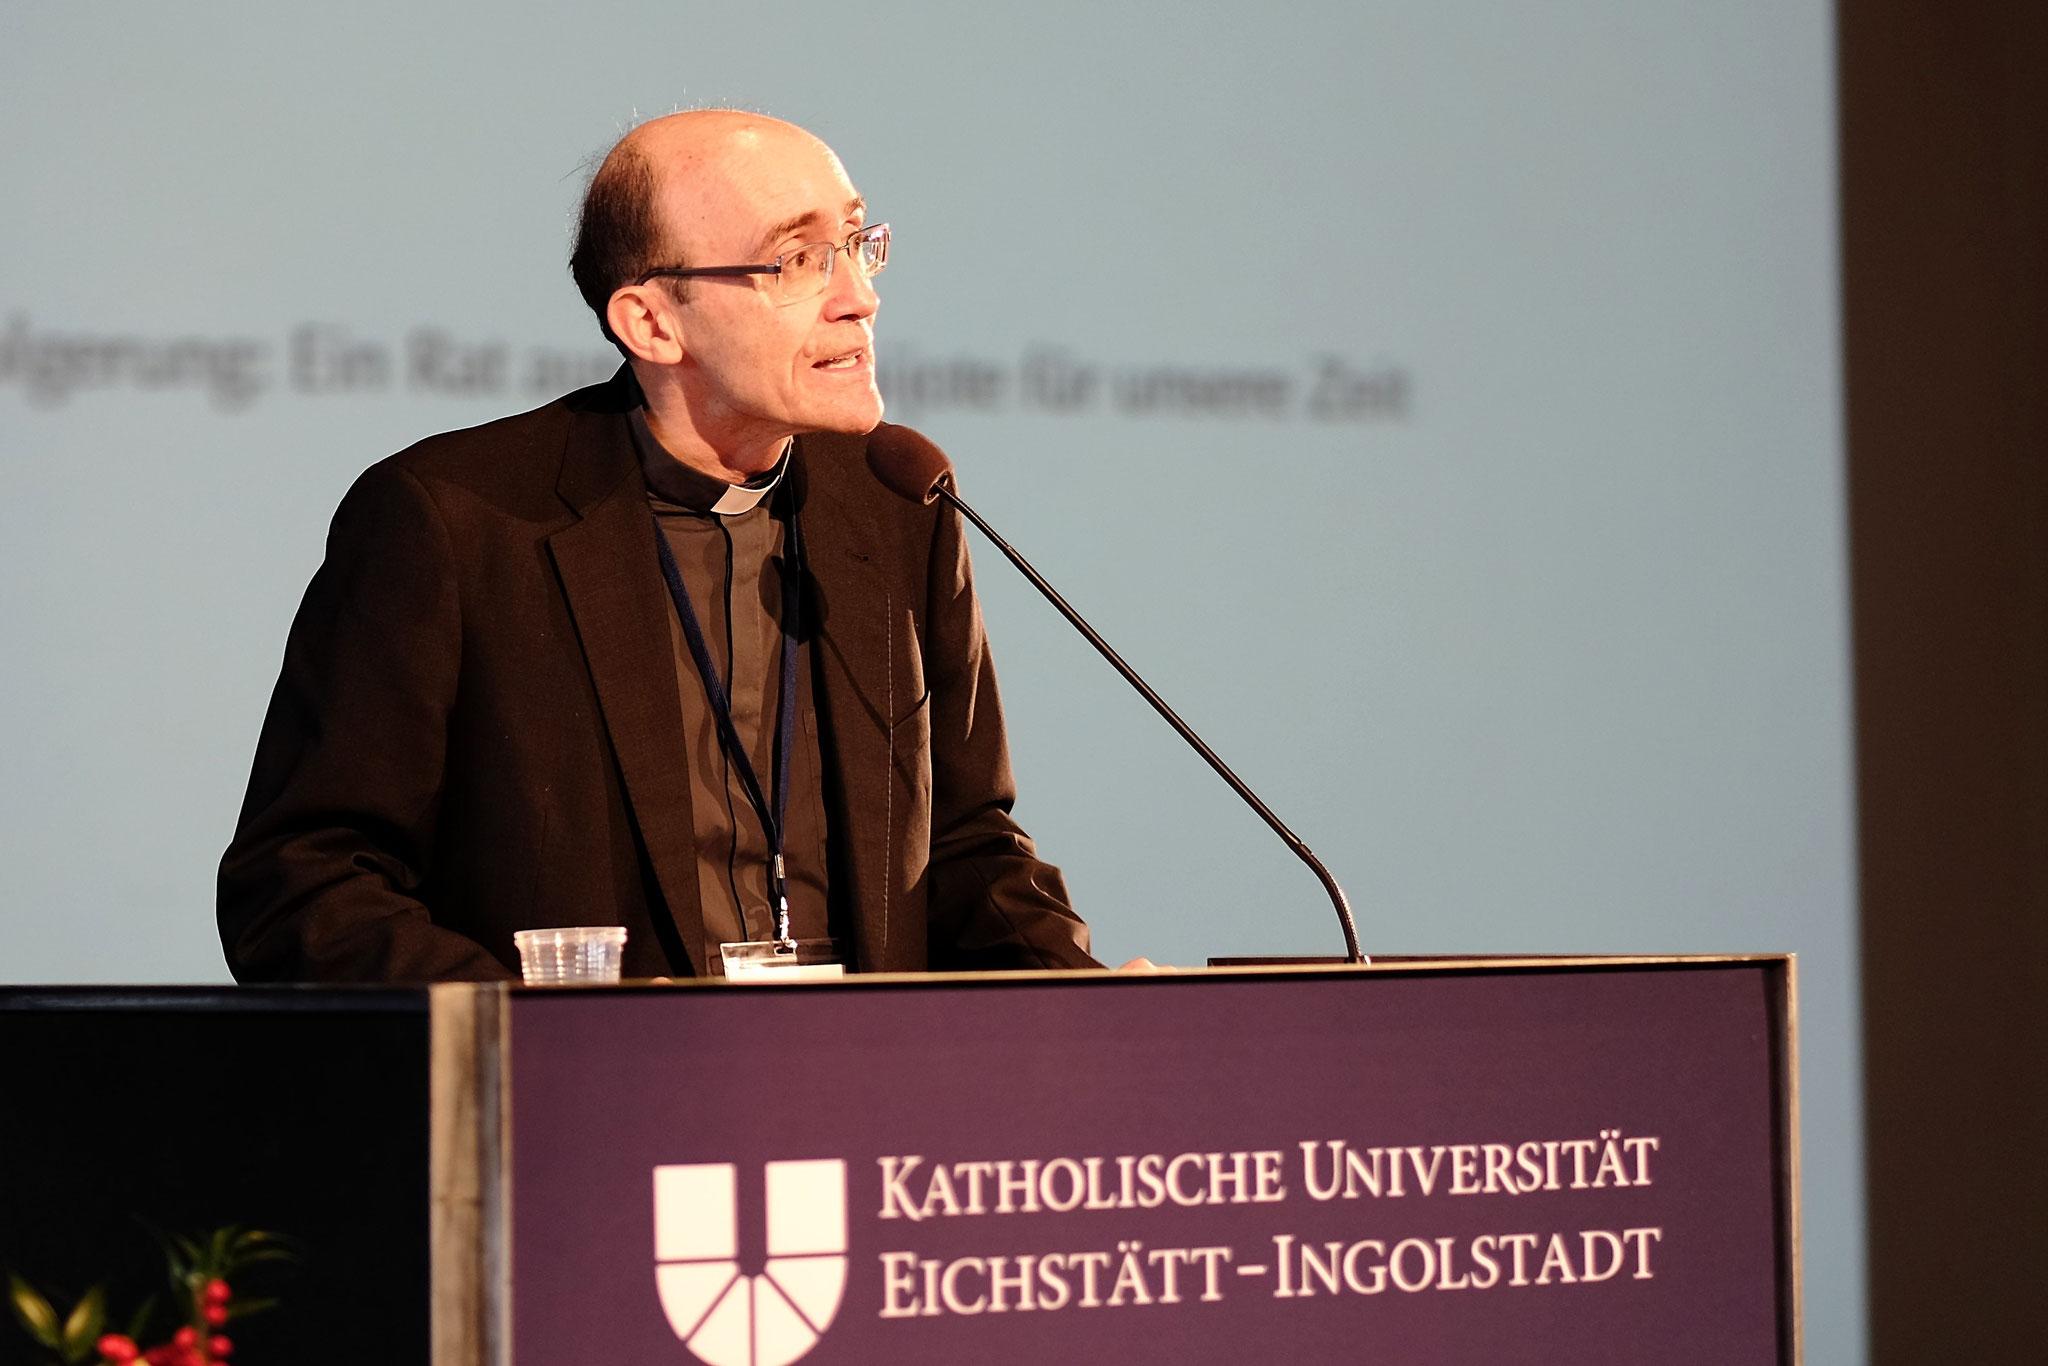 Prof. Javier Prades